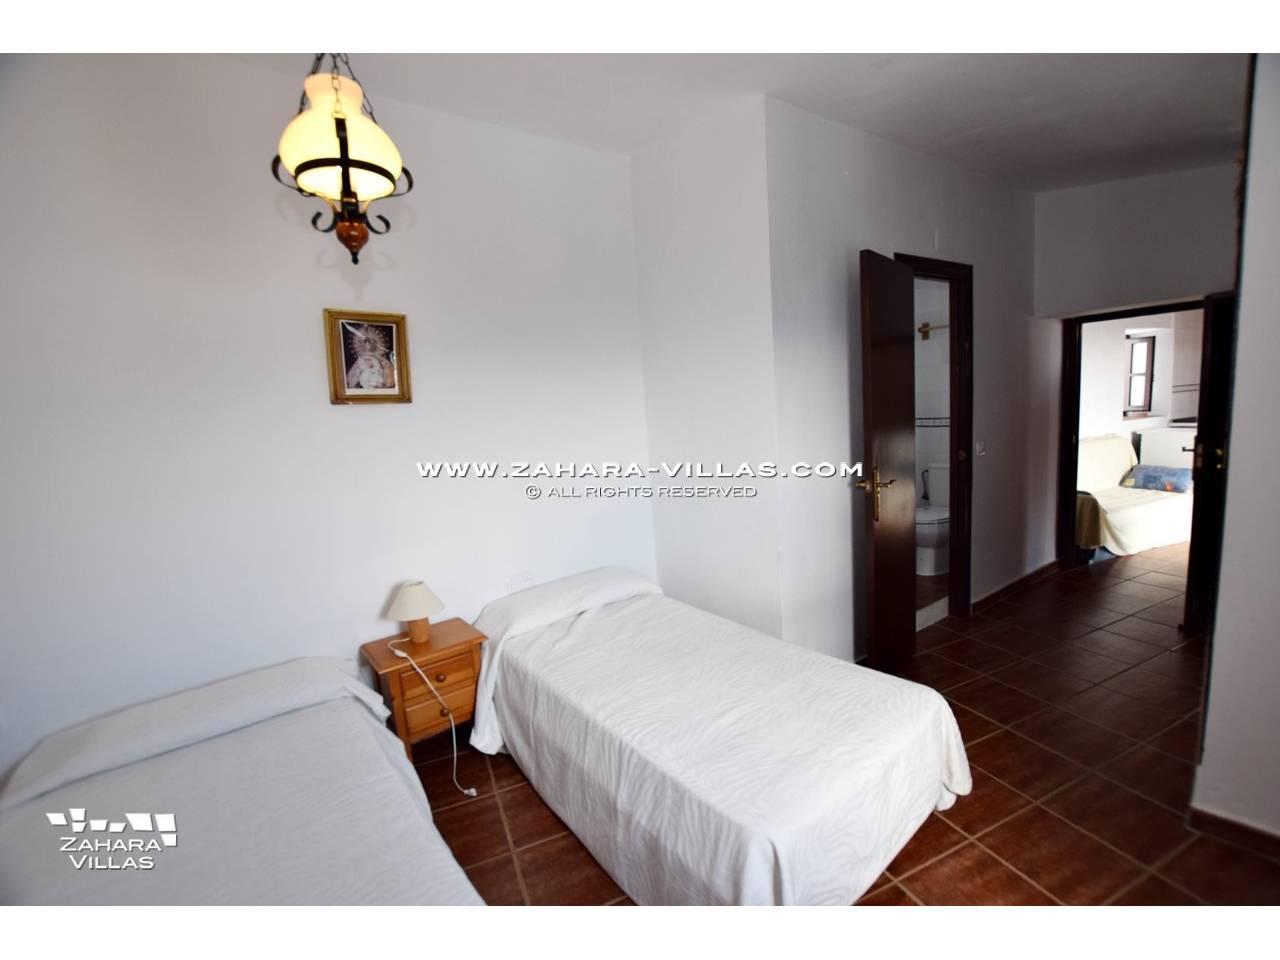 Imagen 4 de House, Apartment and Plot to build in the historic center of Vejer de la Frontera